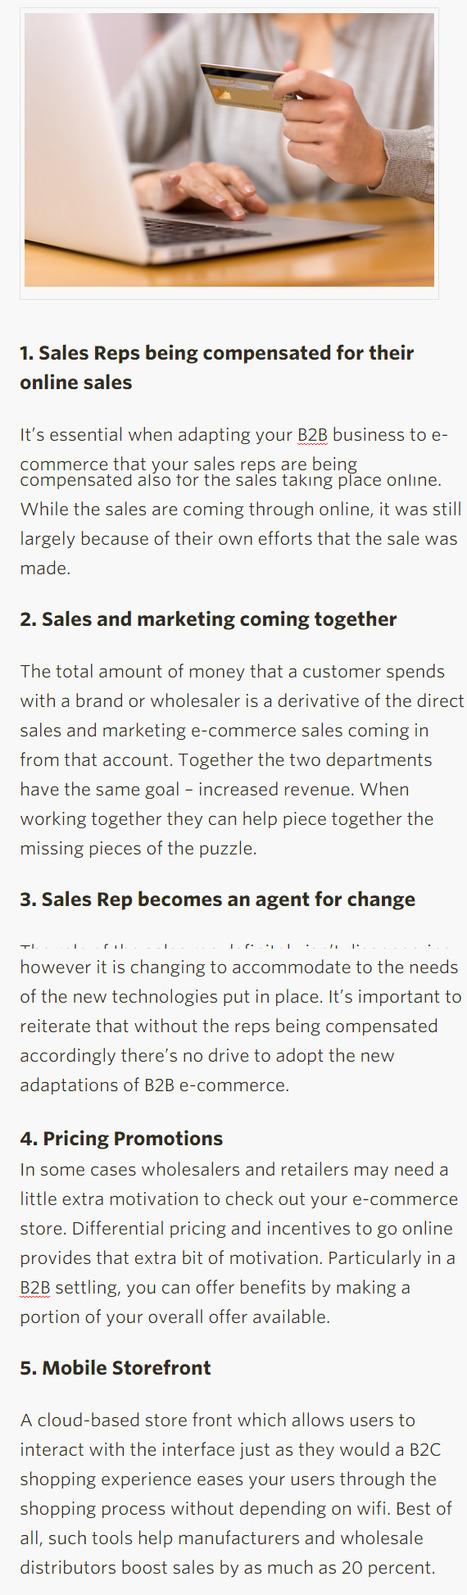 5 Best Practices for B2B E-Commerce Adoption - Salesforce | 123MULTIMEDIA | Scoop.it